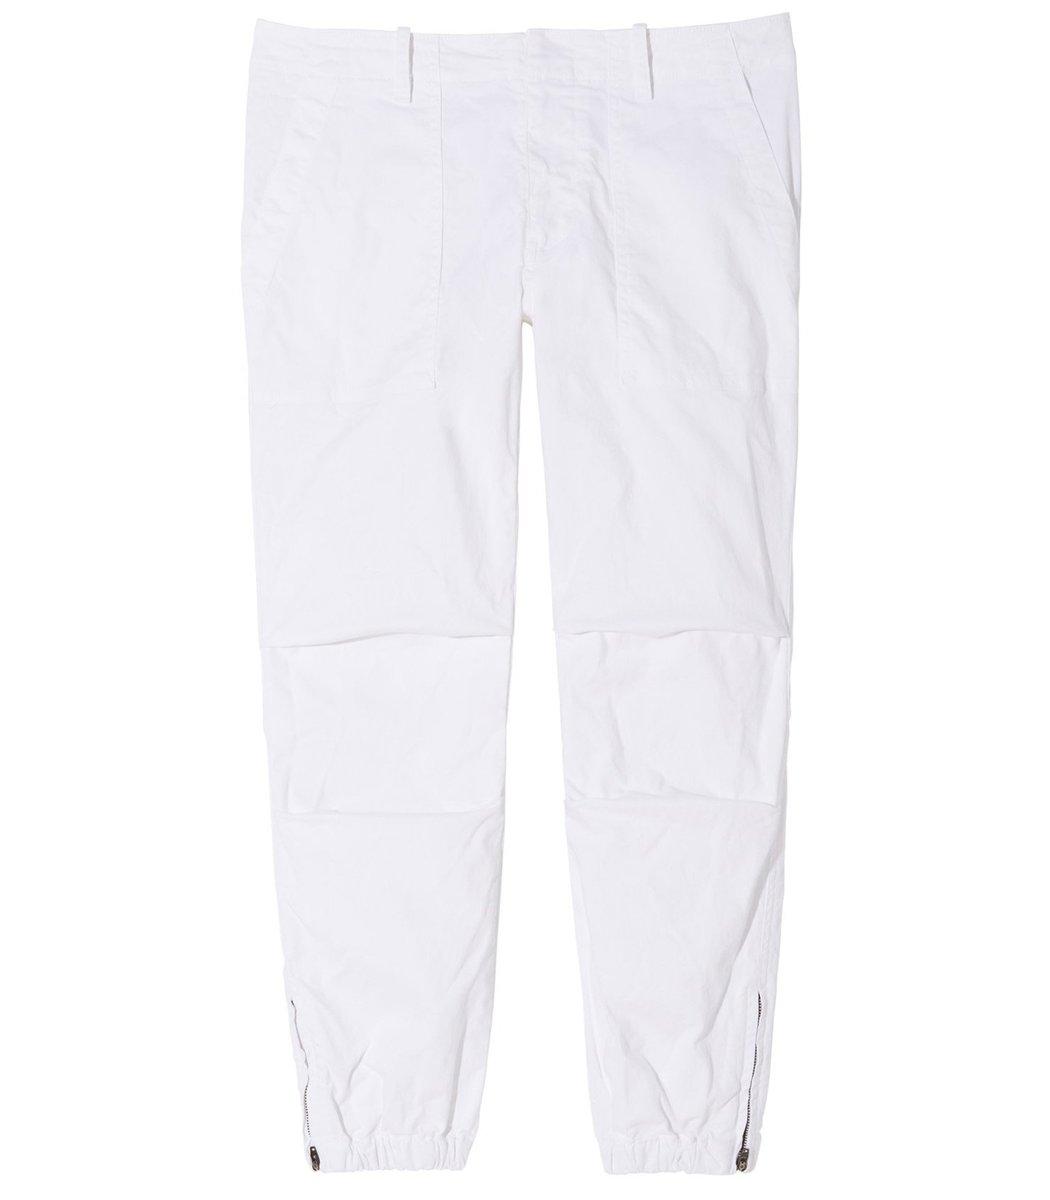 Nili Lotan Cropped Military Pant in White